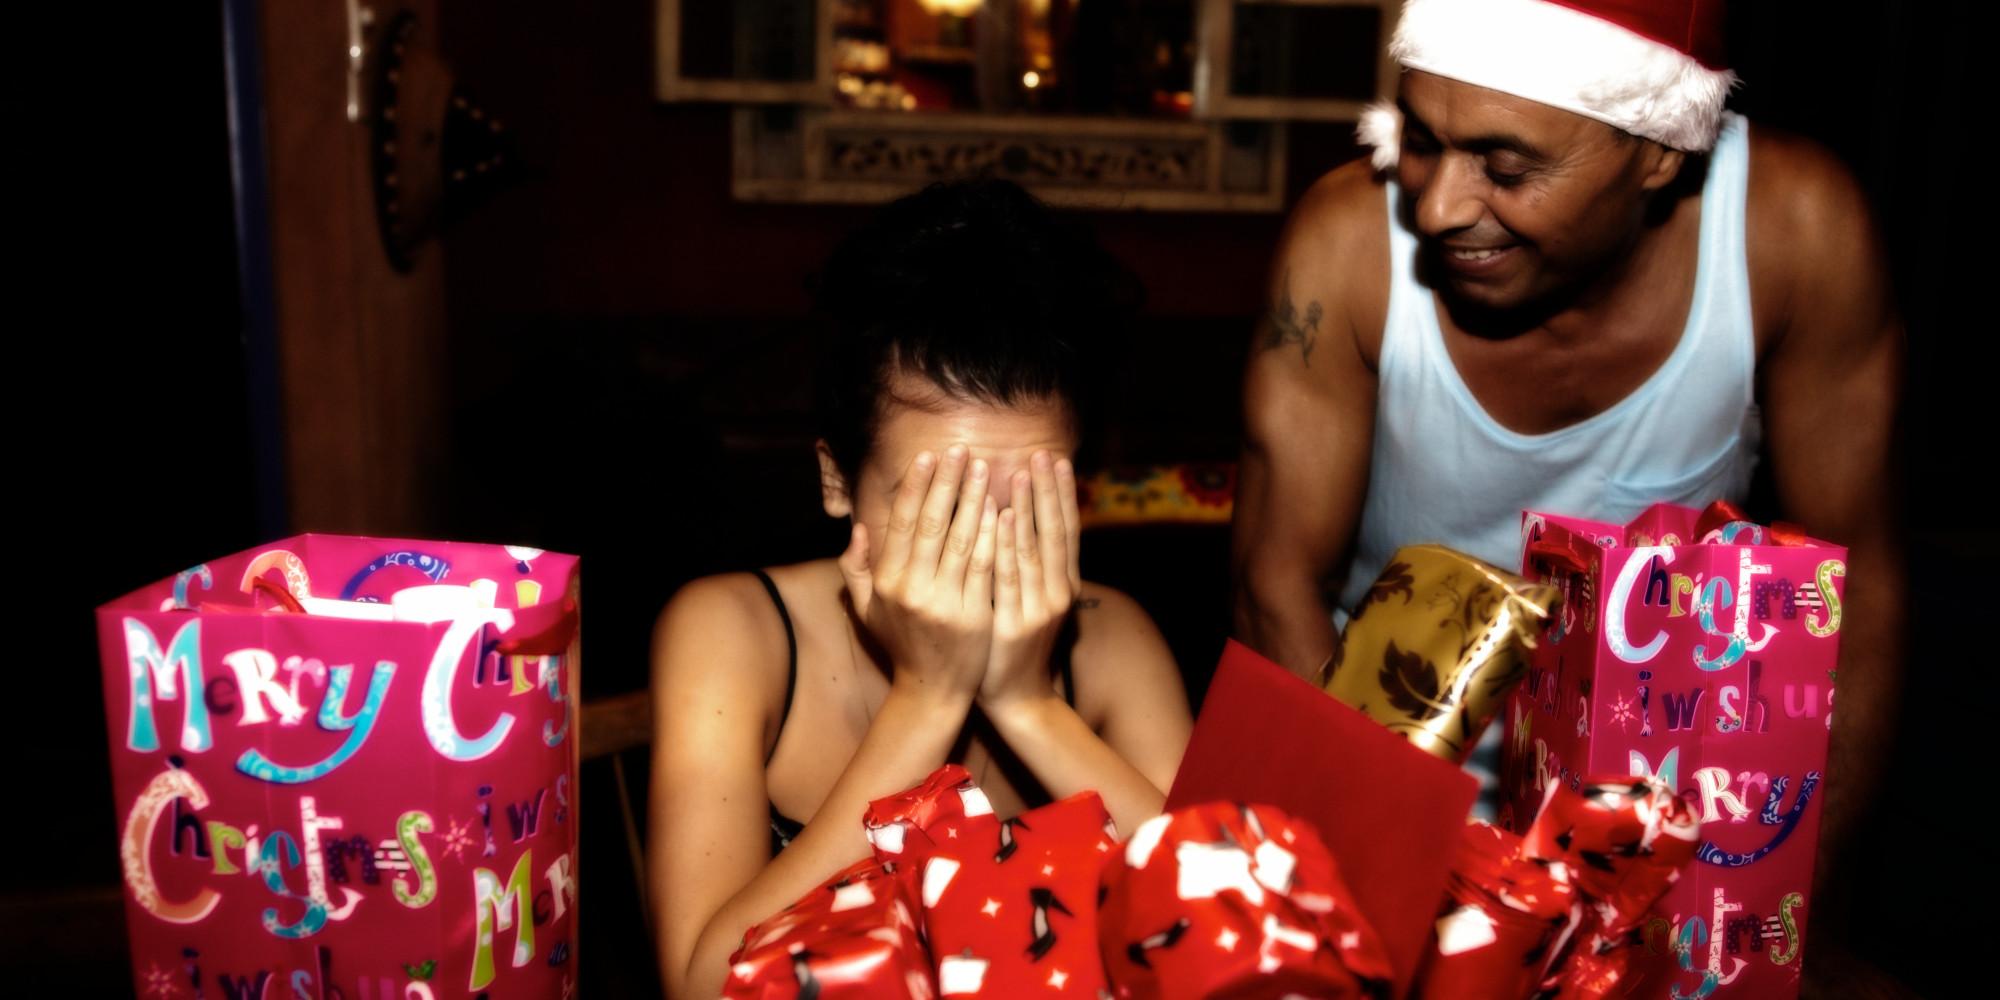 Gf Gift Ideas Christmas - Eskayalitim